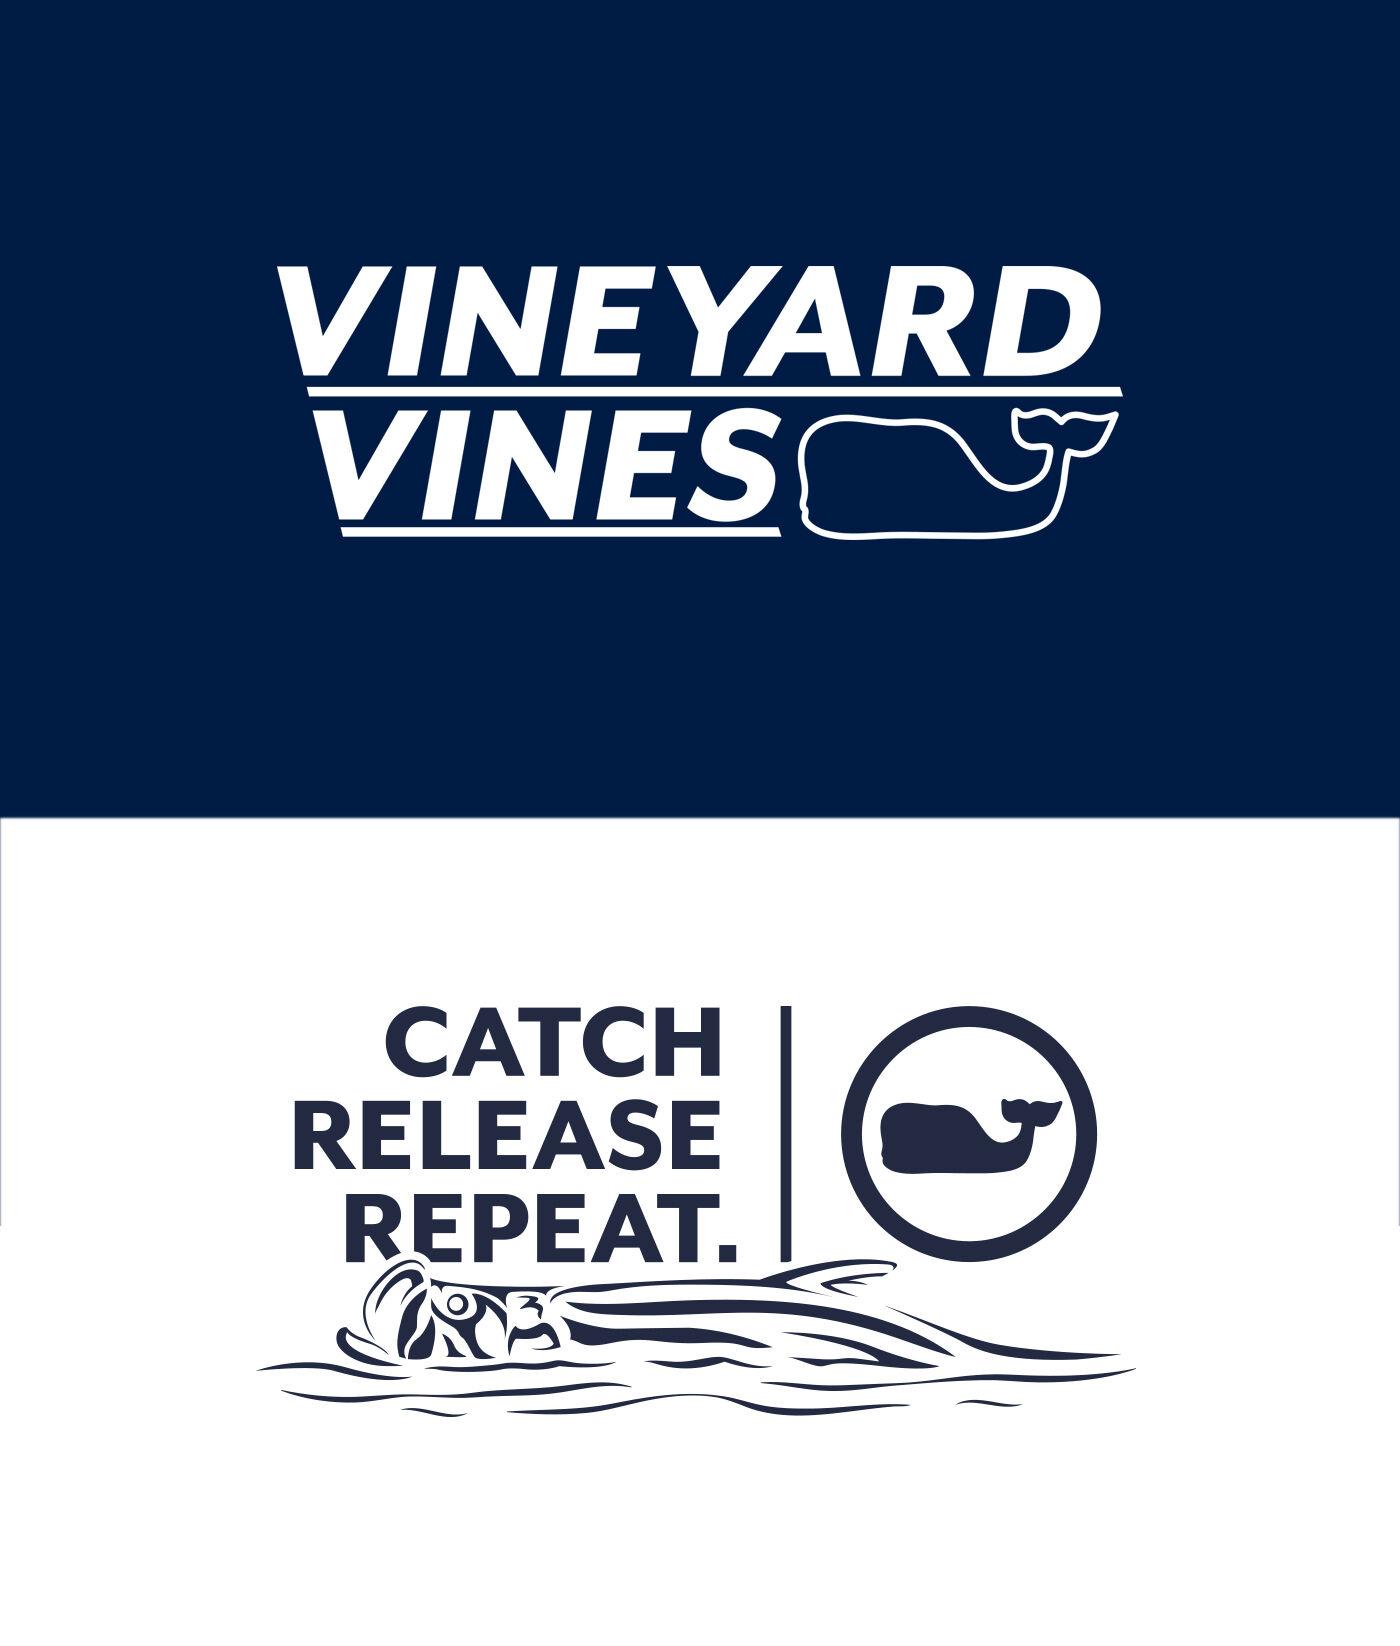 Decal Vineyard Vines Vinyl Sticker Pick One